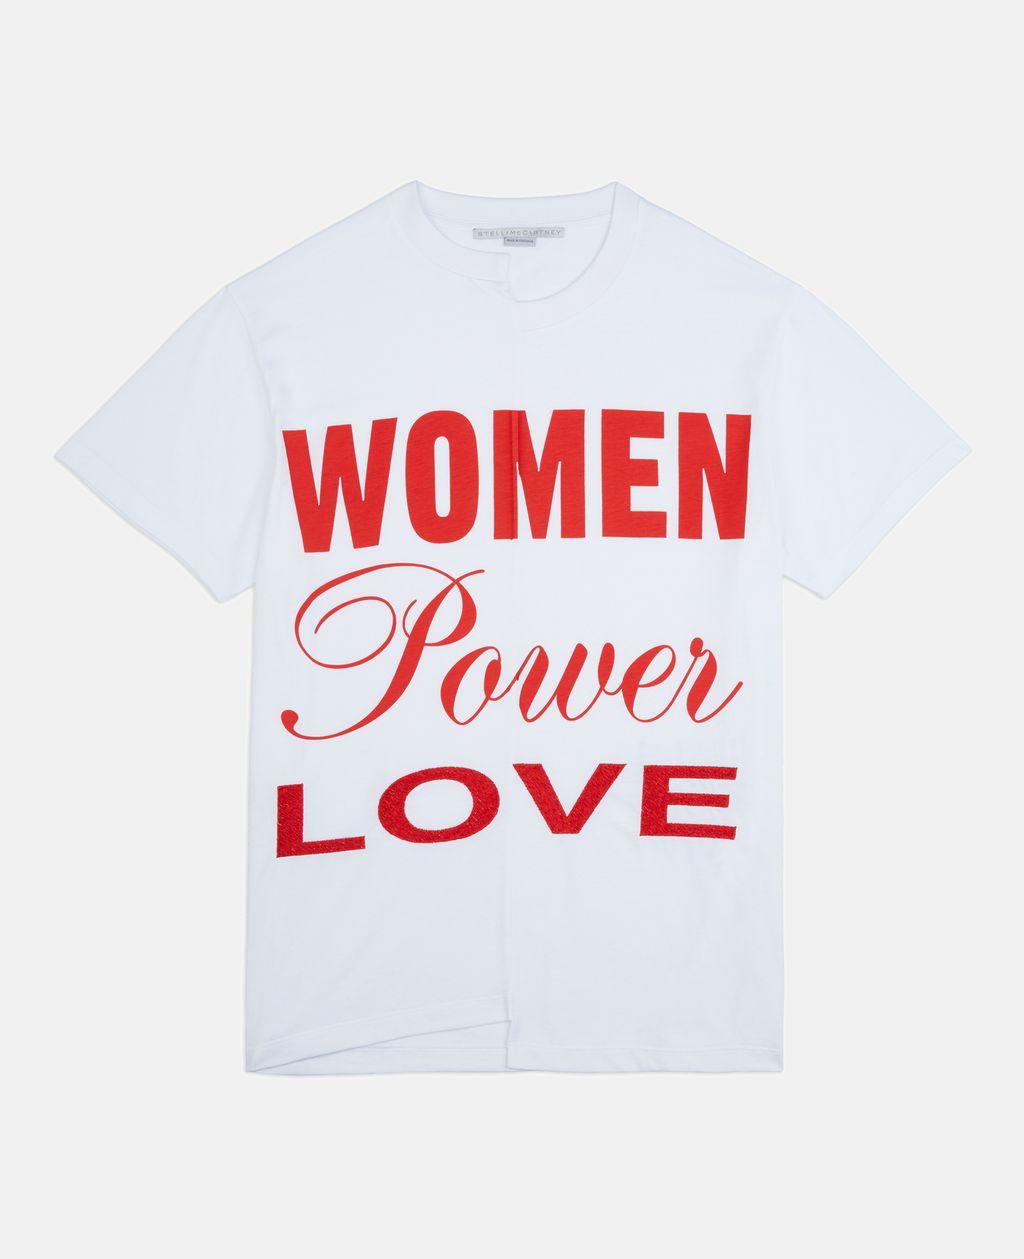 Powered By Women T-shirt